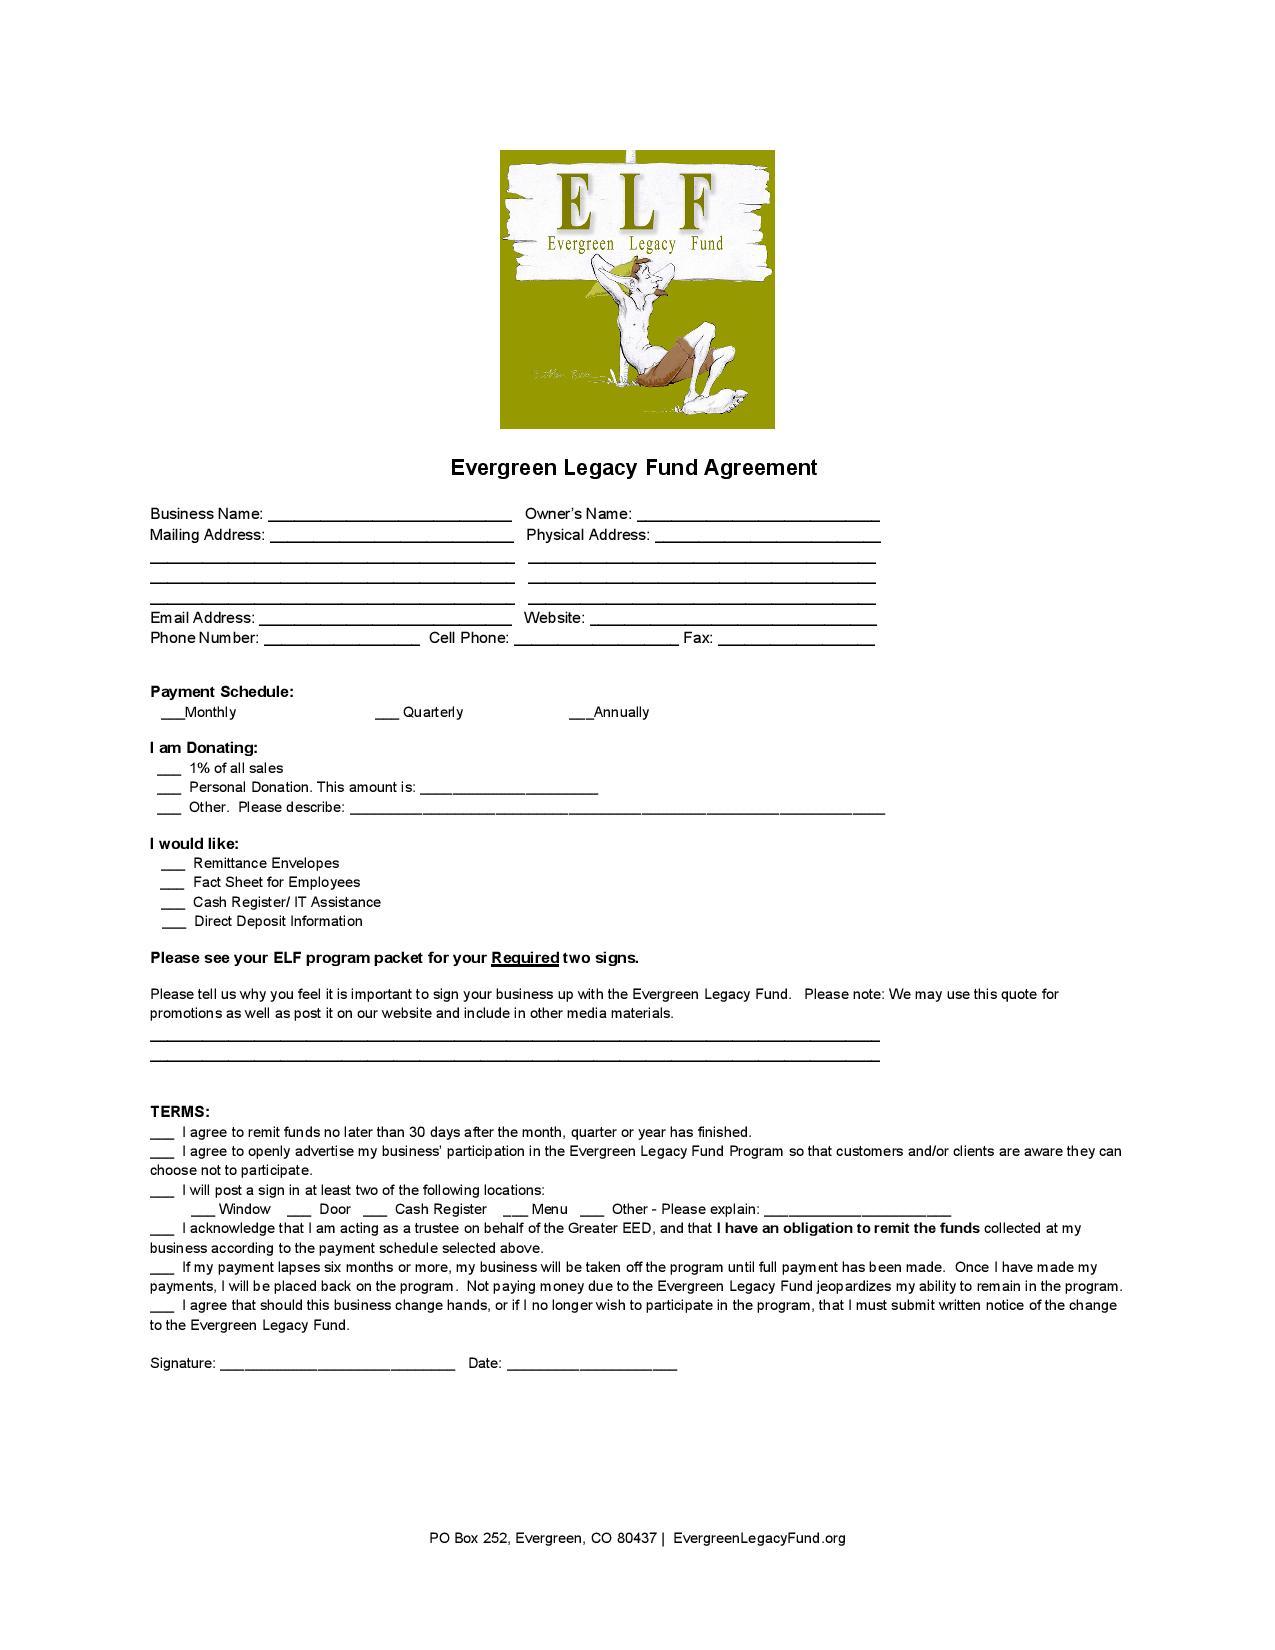 ELF Agreement